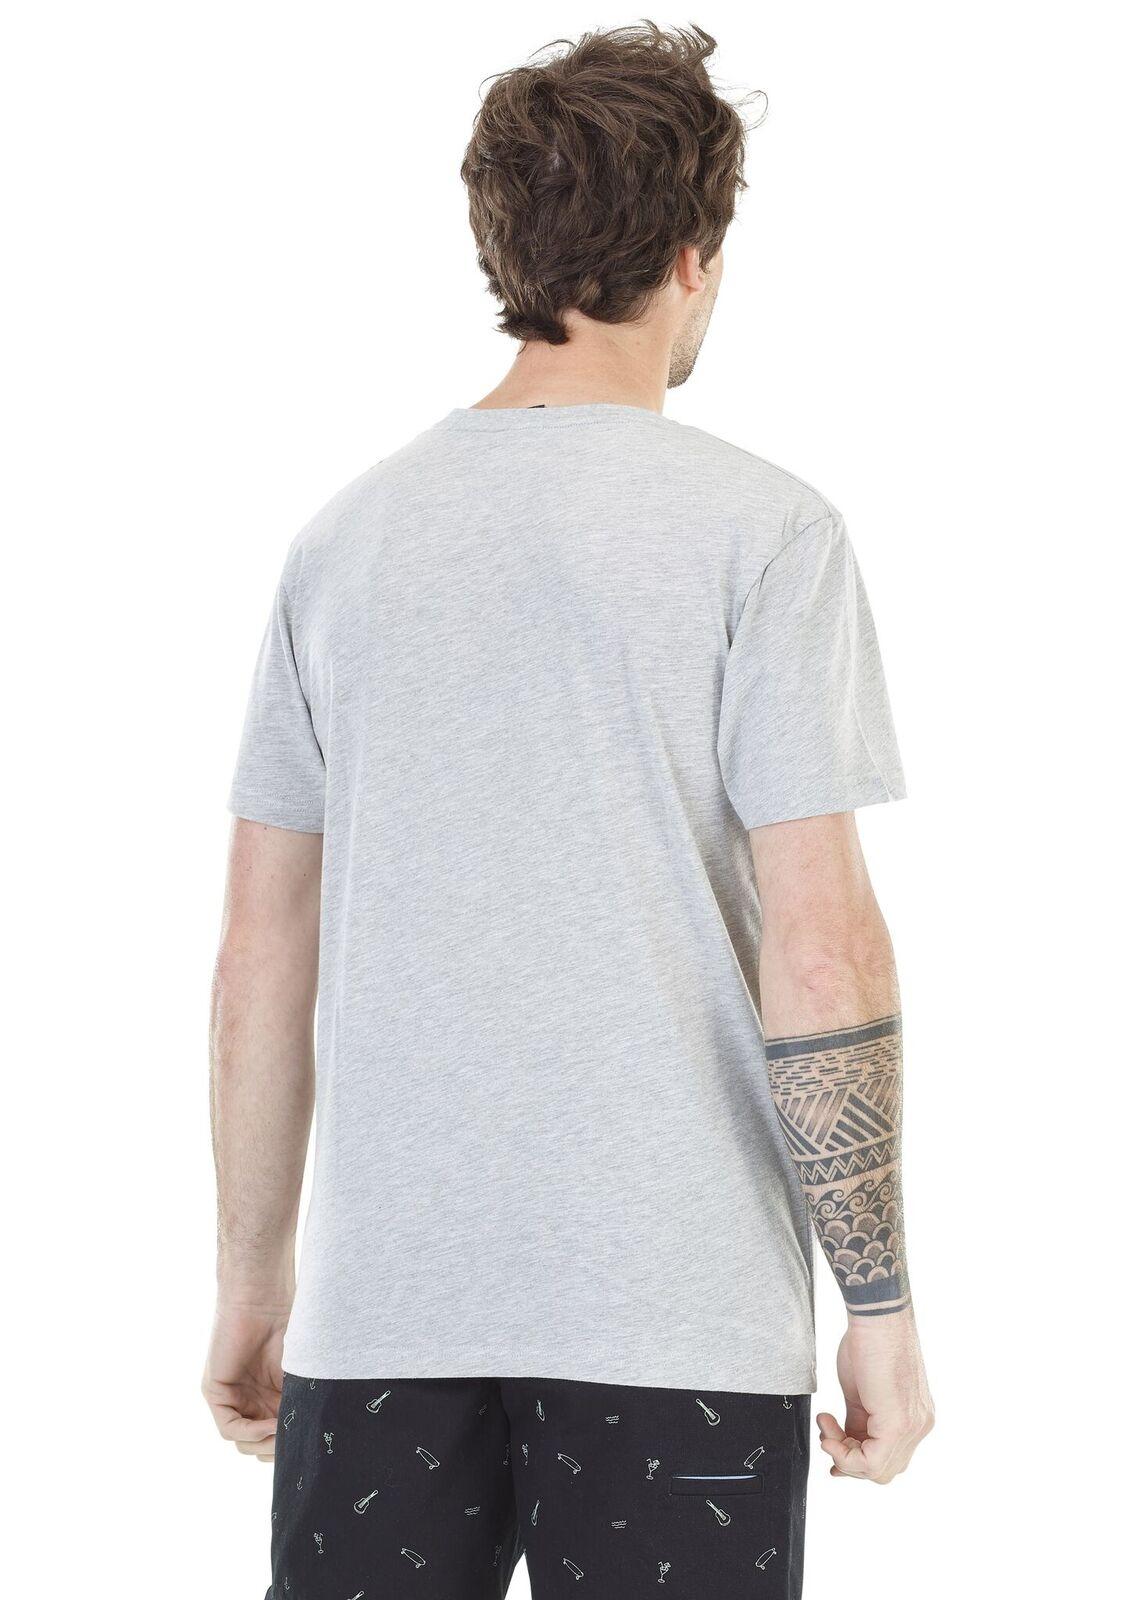 Palm Basement Melange Grey T Picture Shirt Organic 0OwNn8vPym